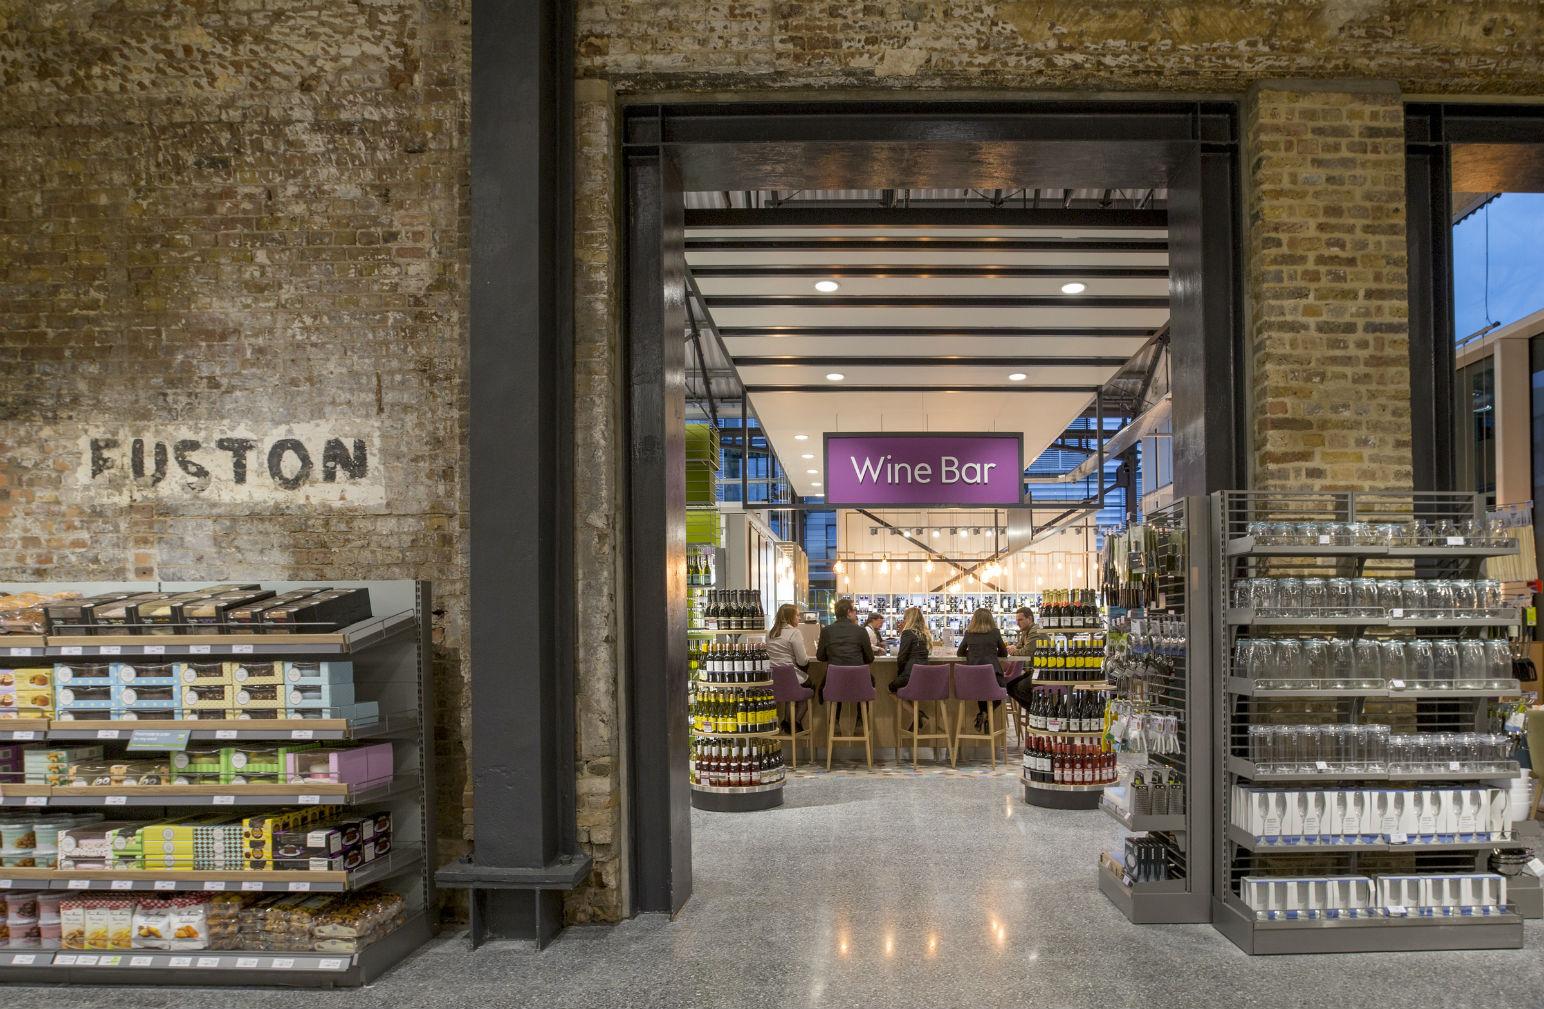 Omg Look At The Wine Bar And Growler Refill At Waitrose